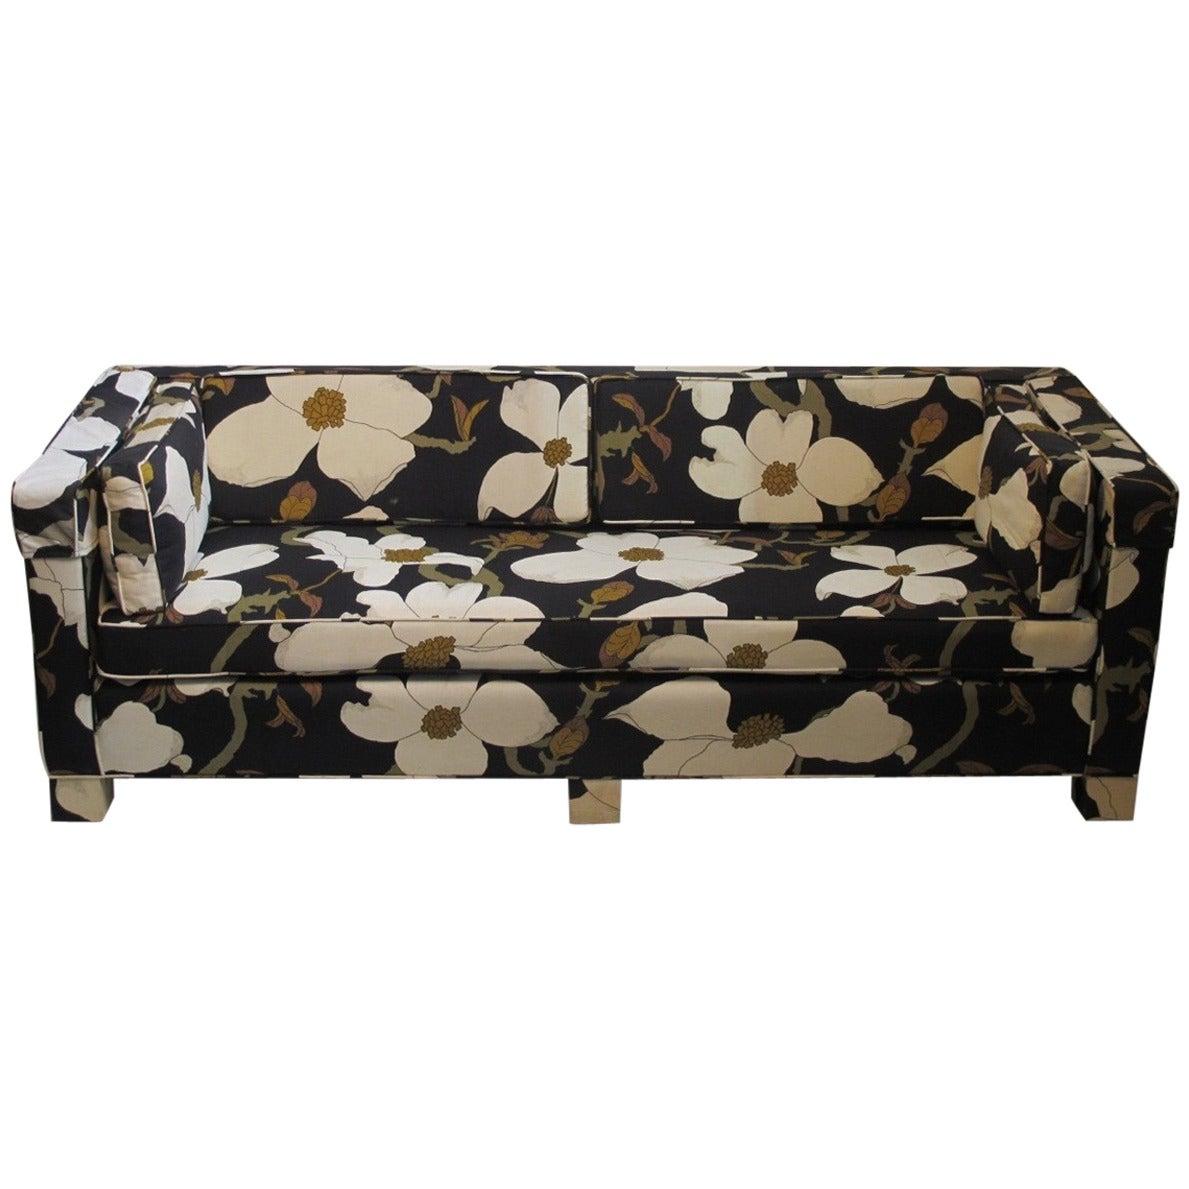 Custom Designer Sofa Mid 20th Century At 1stdibs